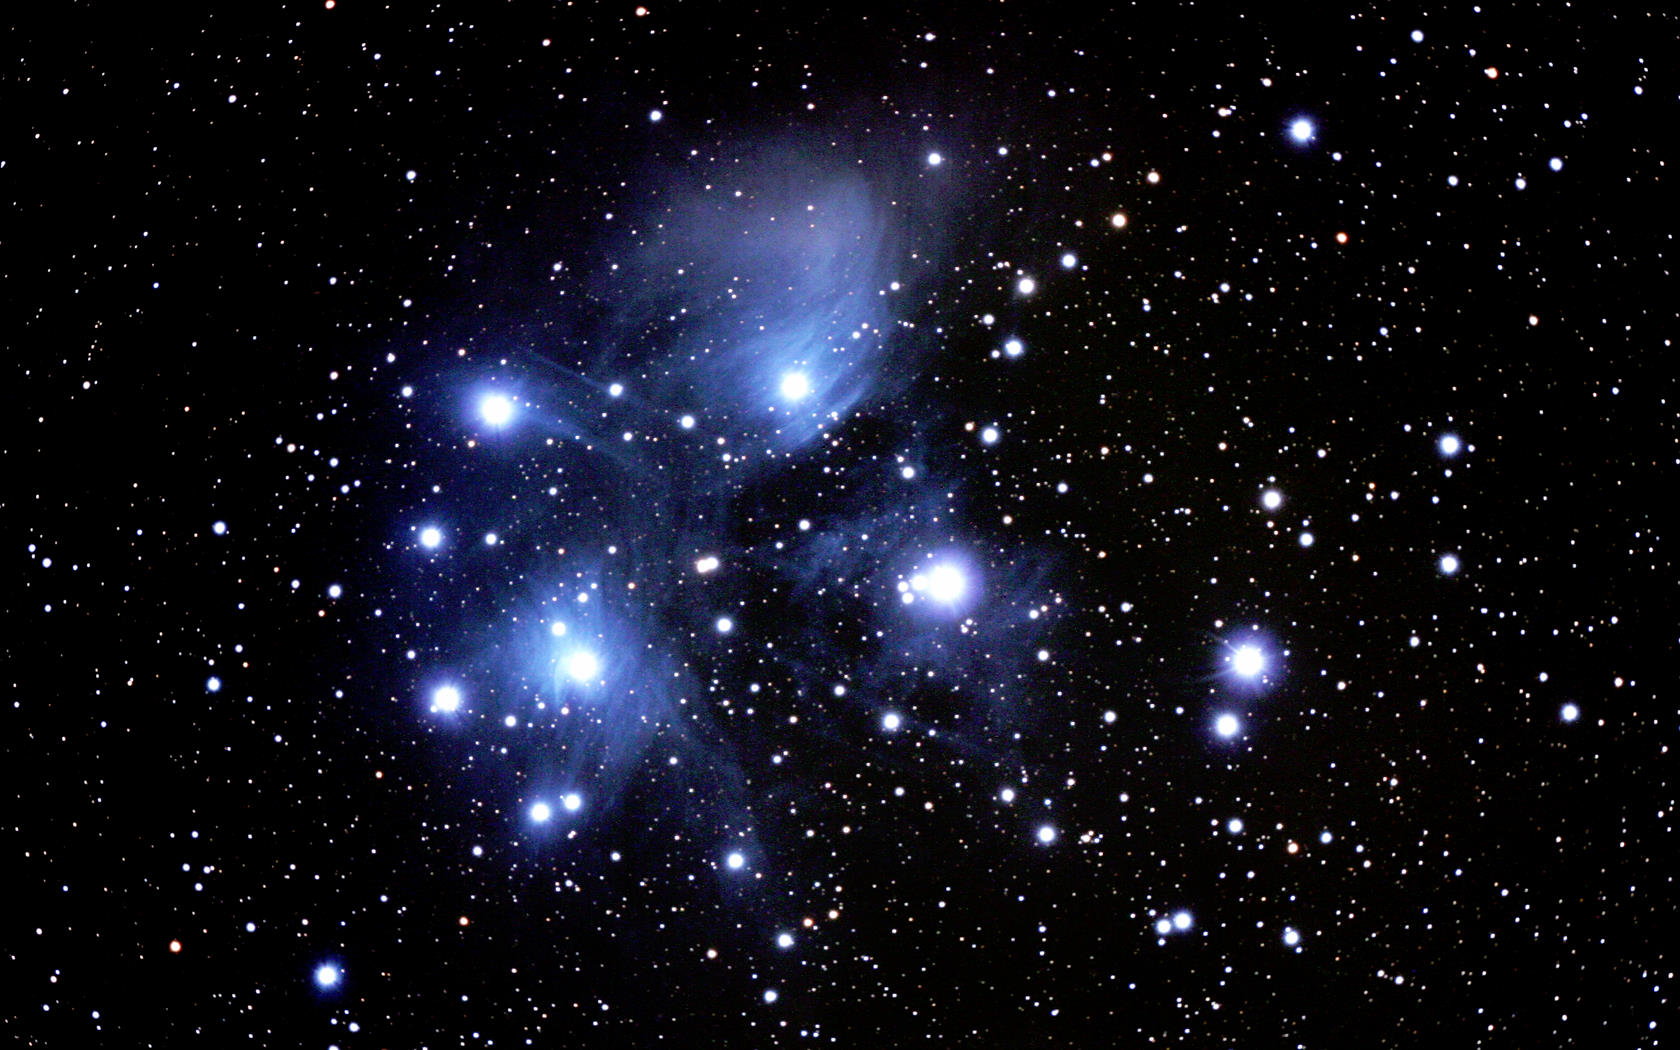 starcluster wallpaper - photo #29